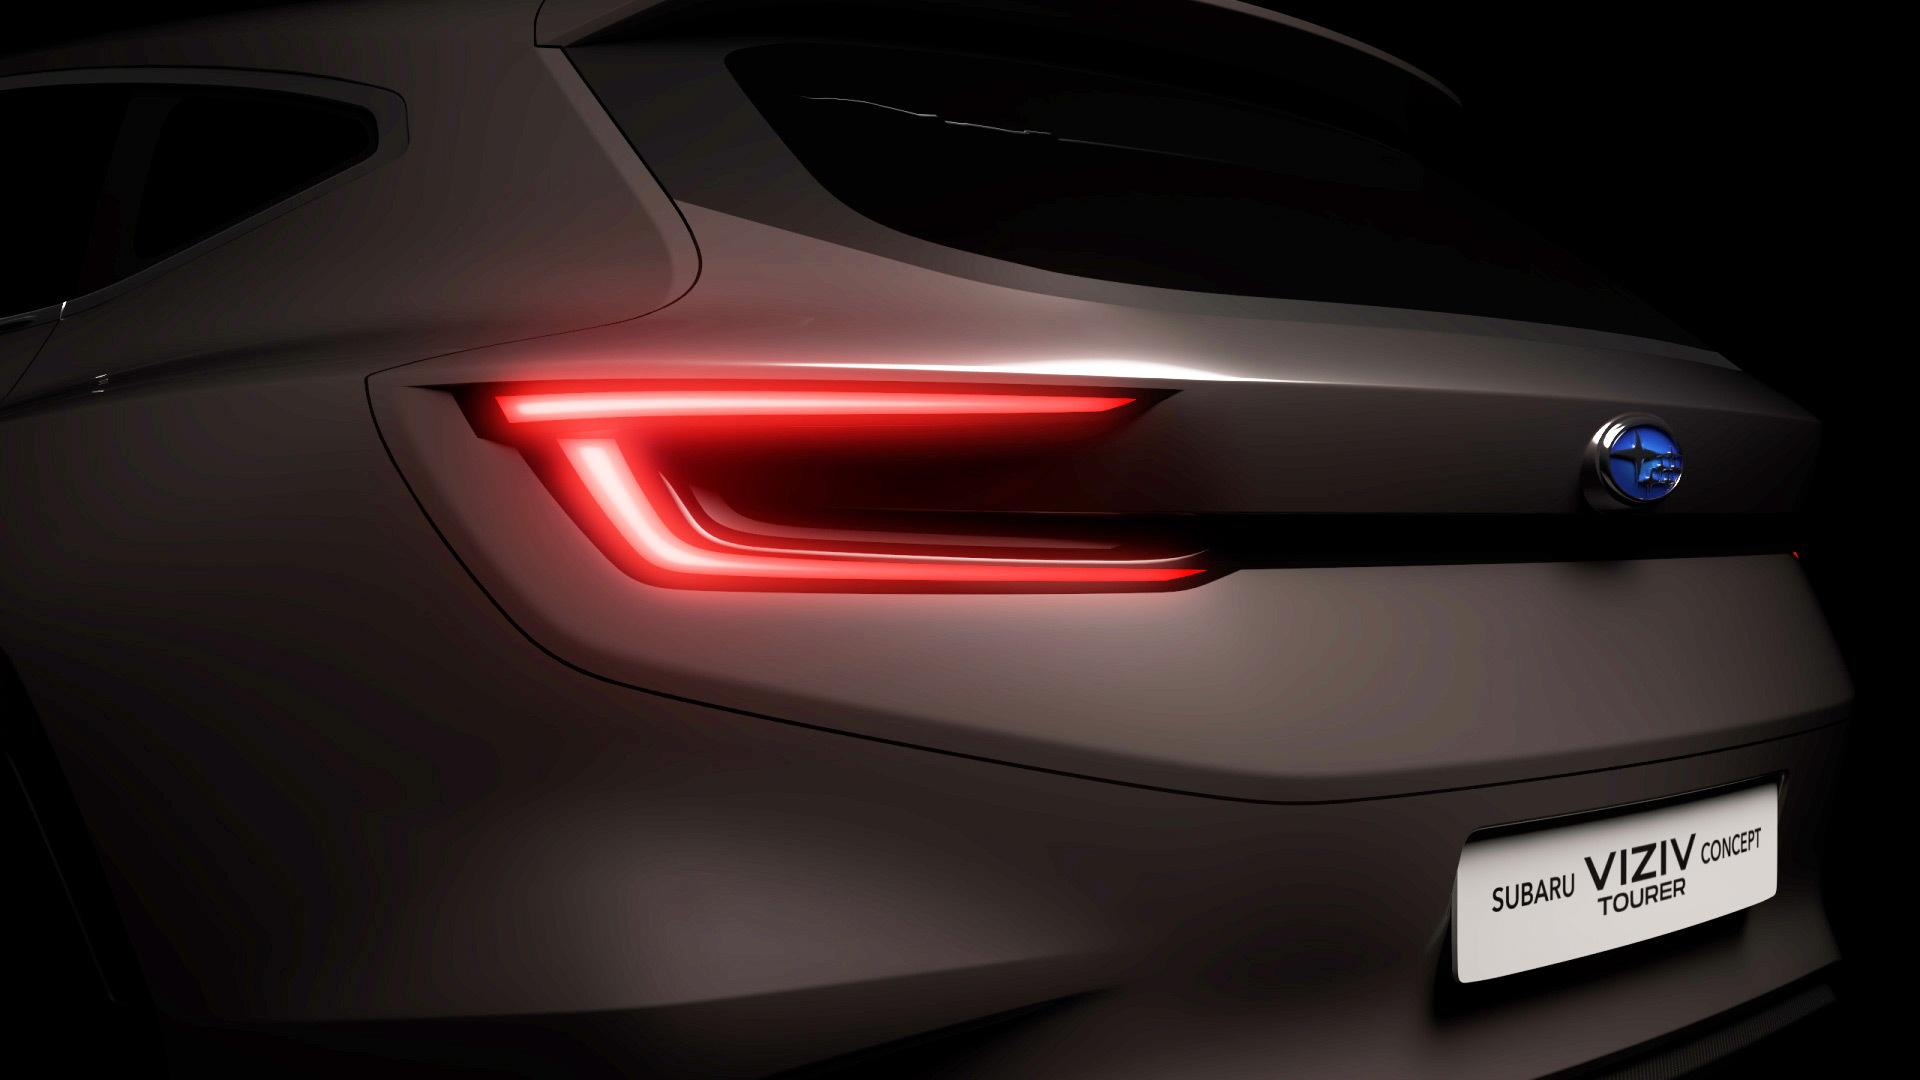 Teaser for Subaru Viziv Tourer concept debuting at 2018 Geneva auto show